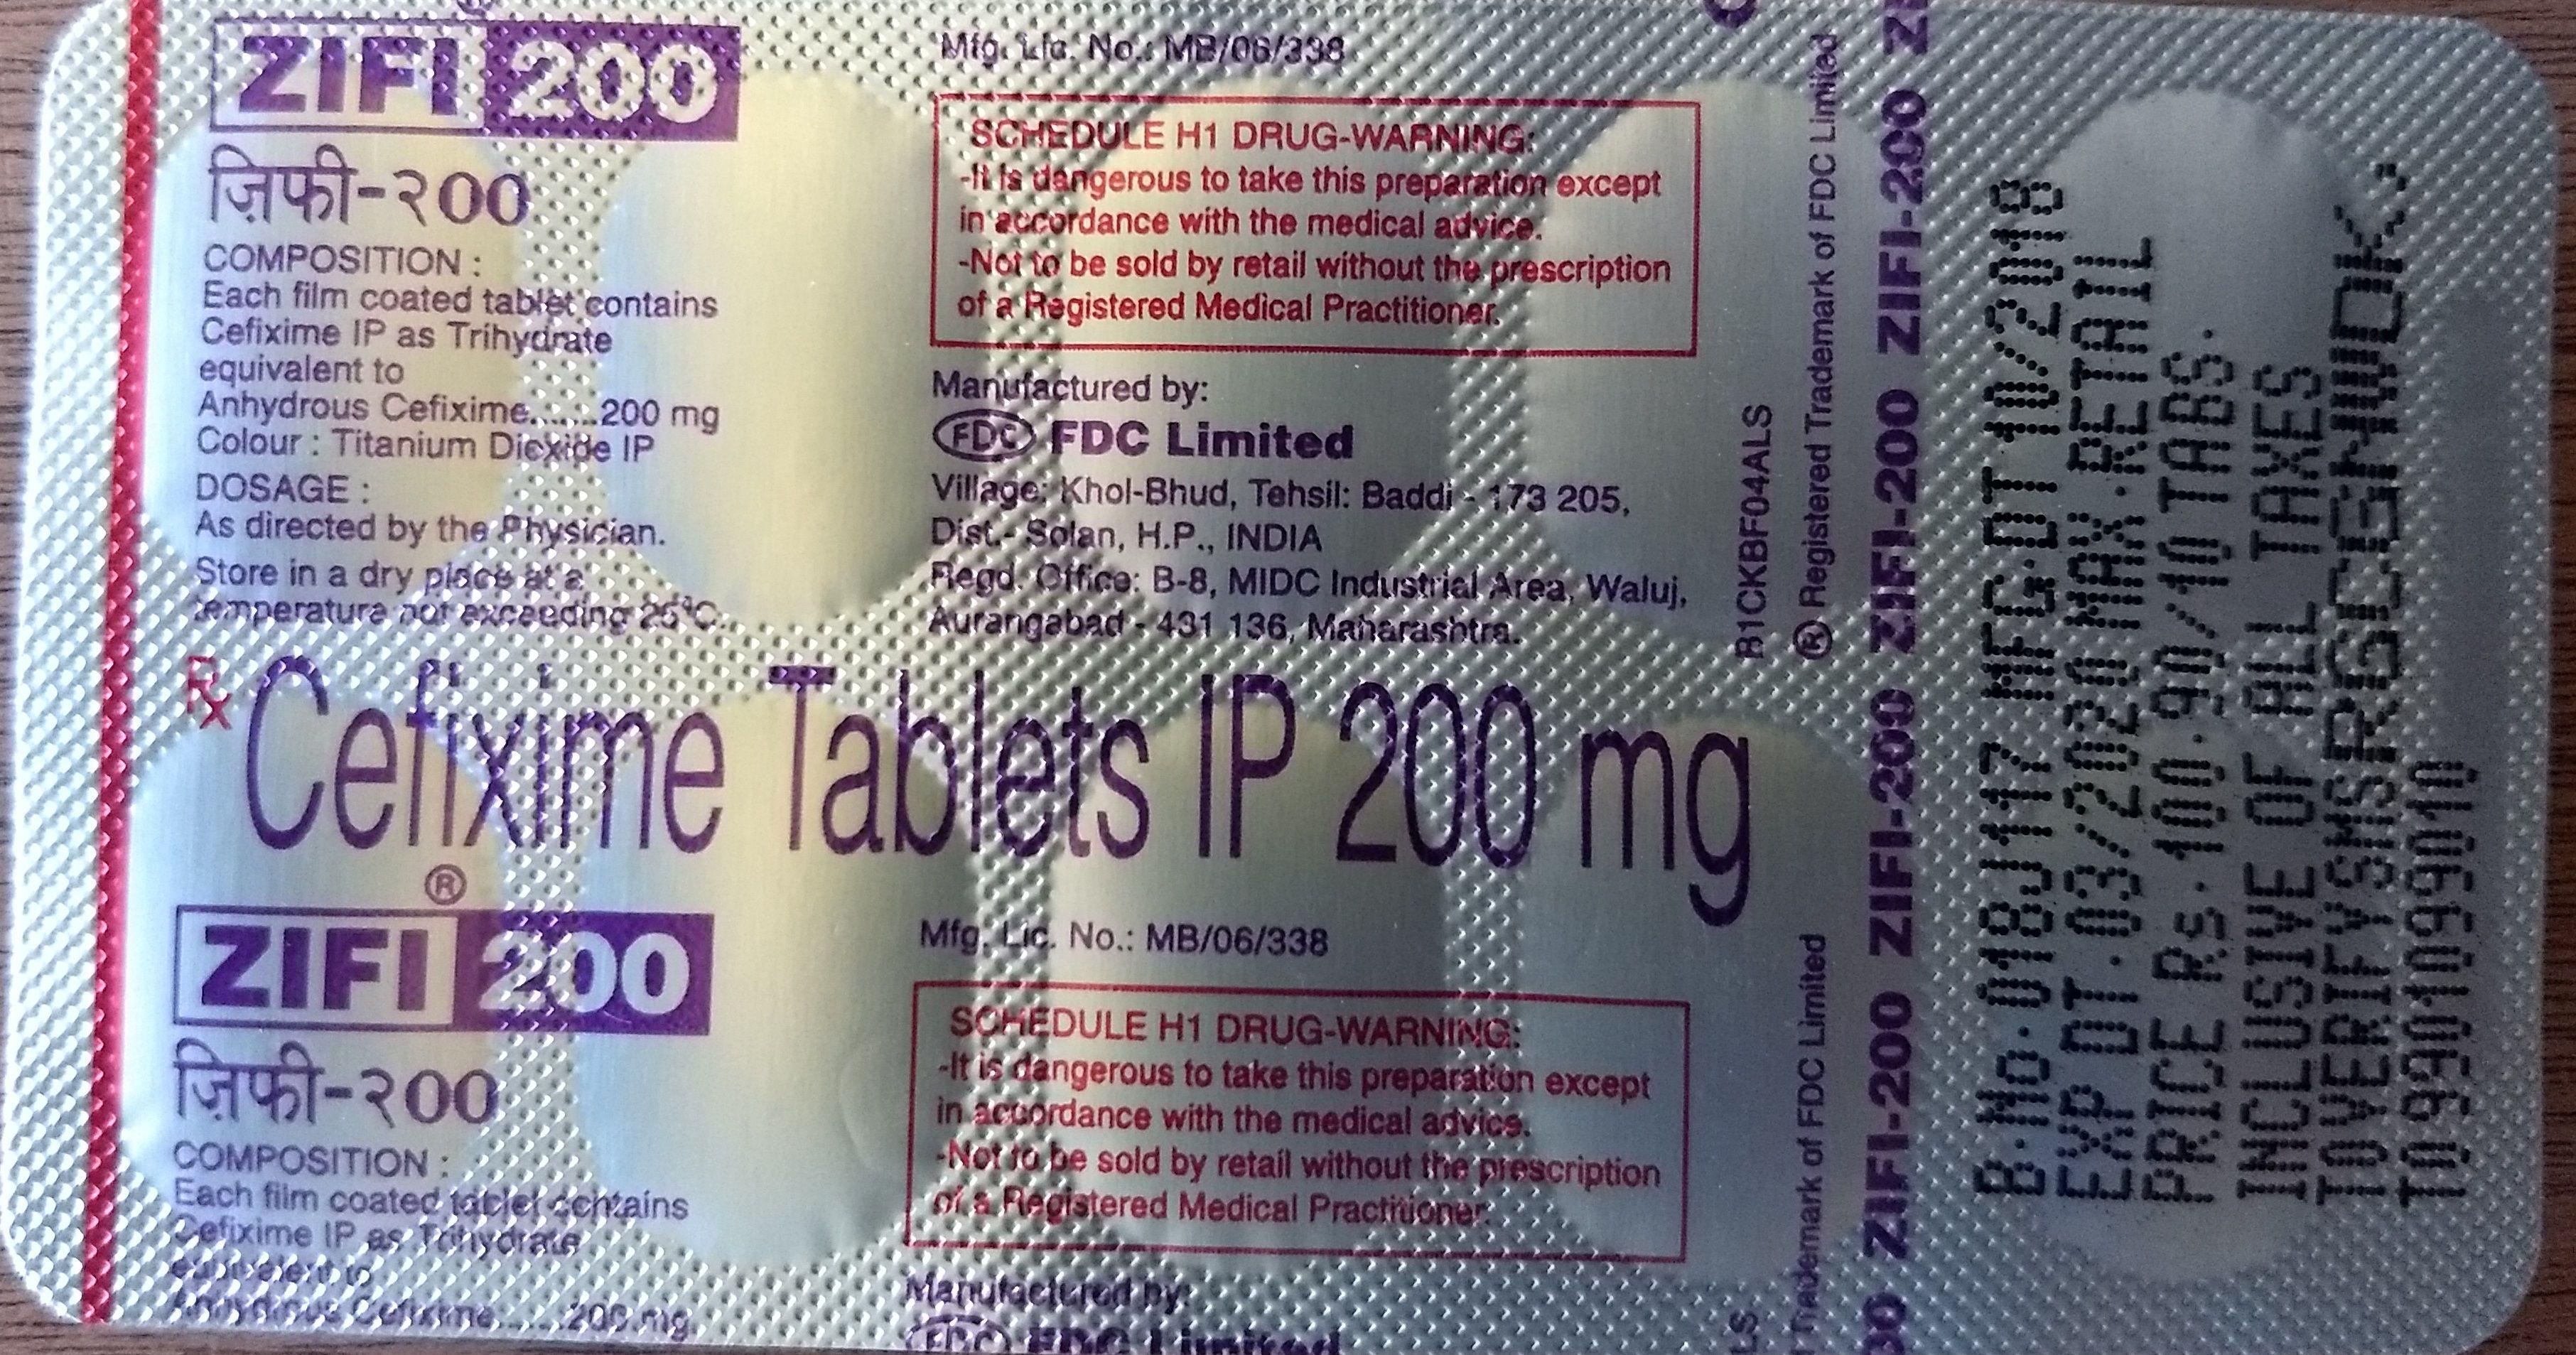 fosinopril hydrochlorothiazide mylan